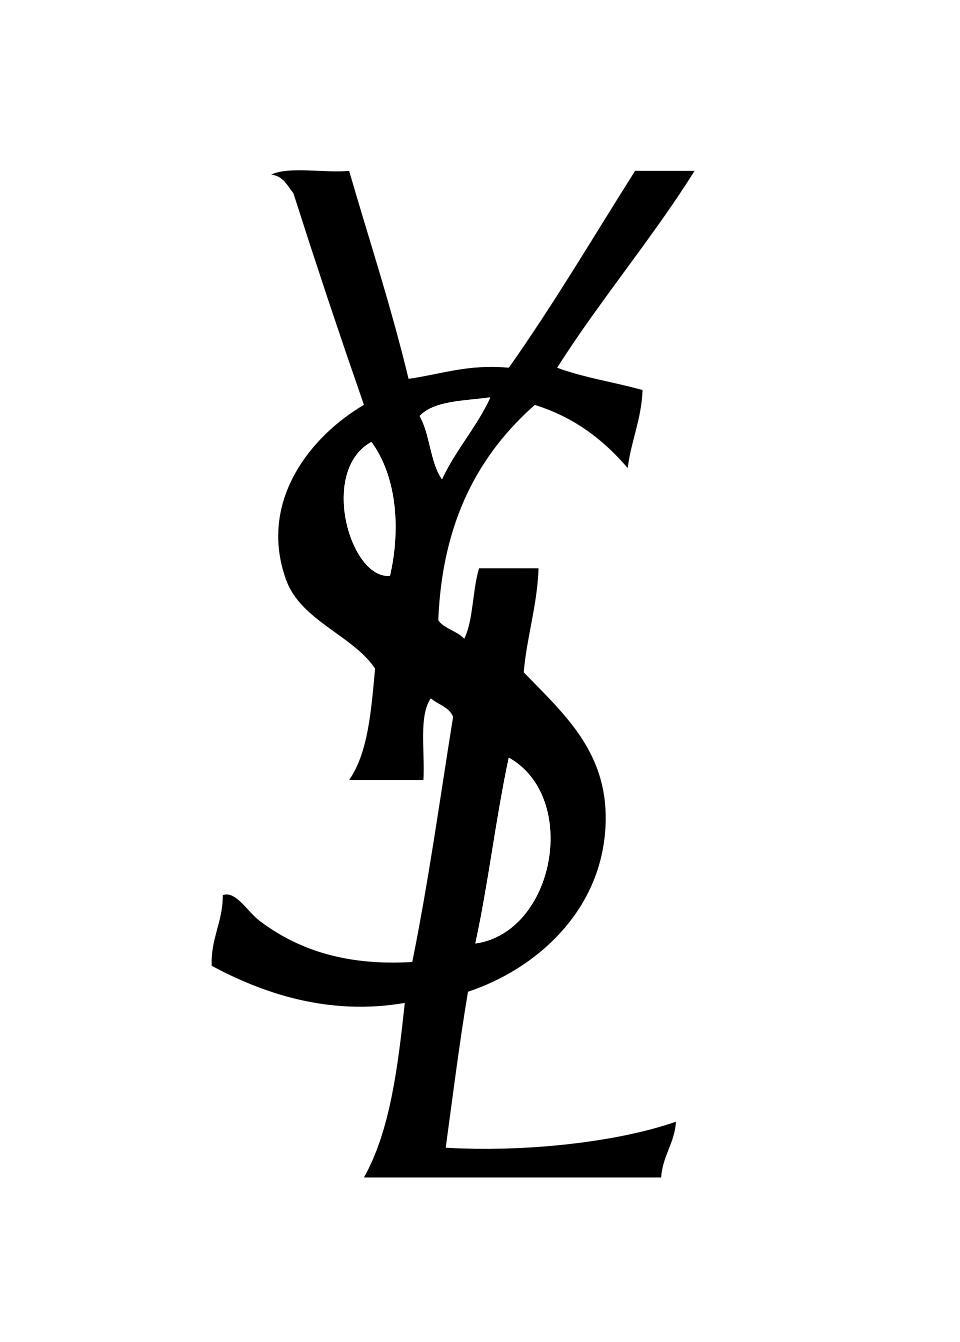 Laranet Logo photo - 1